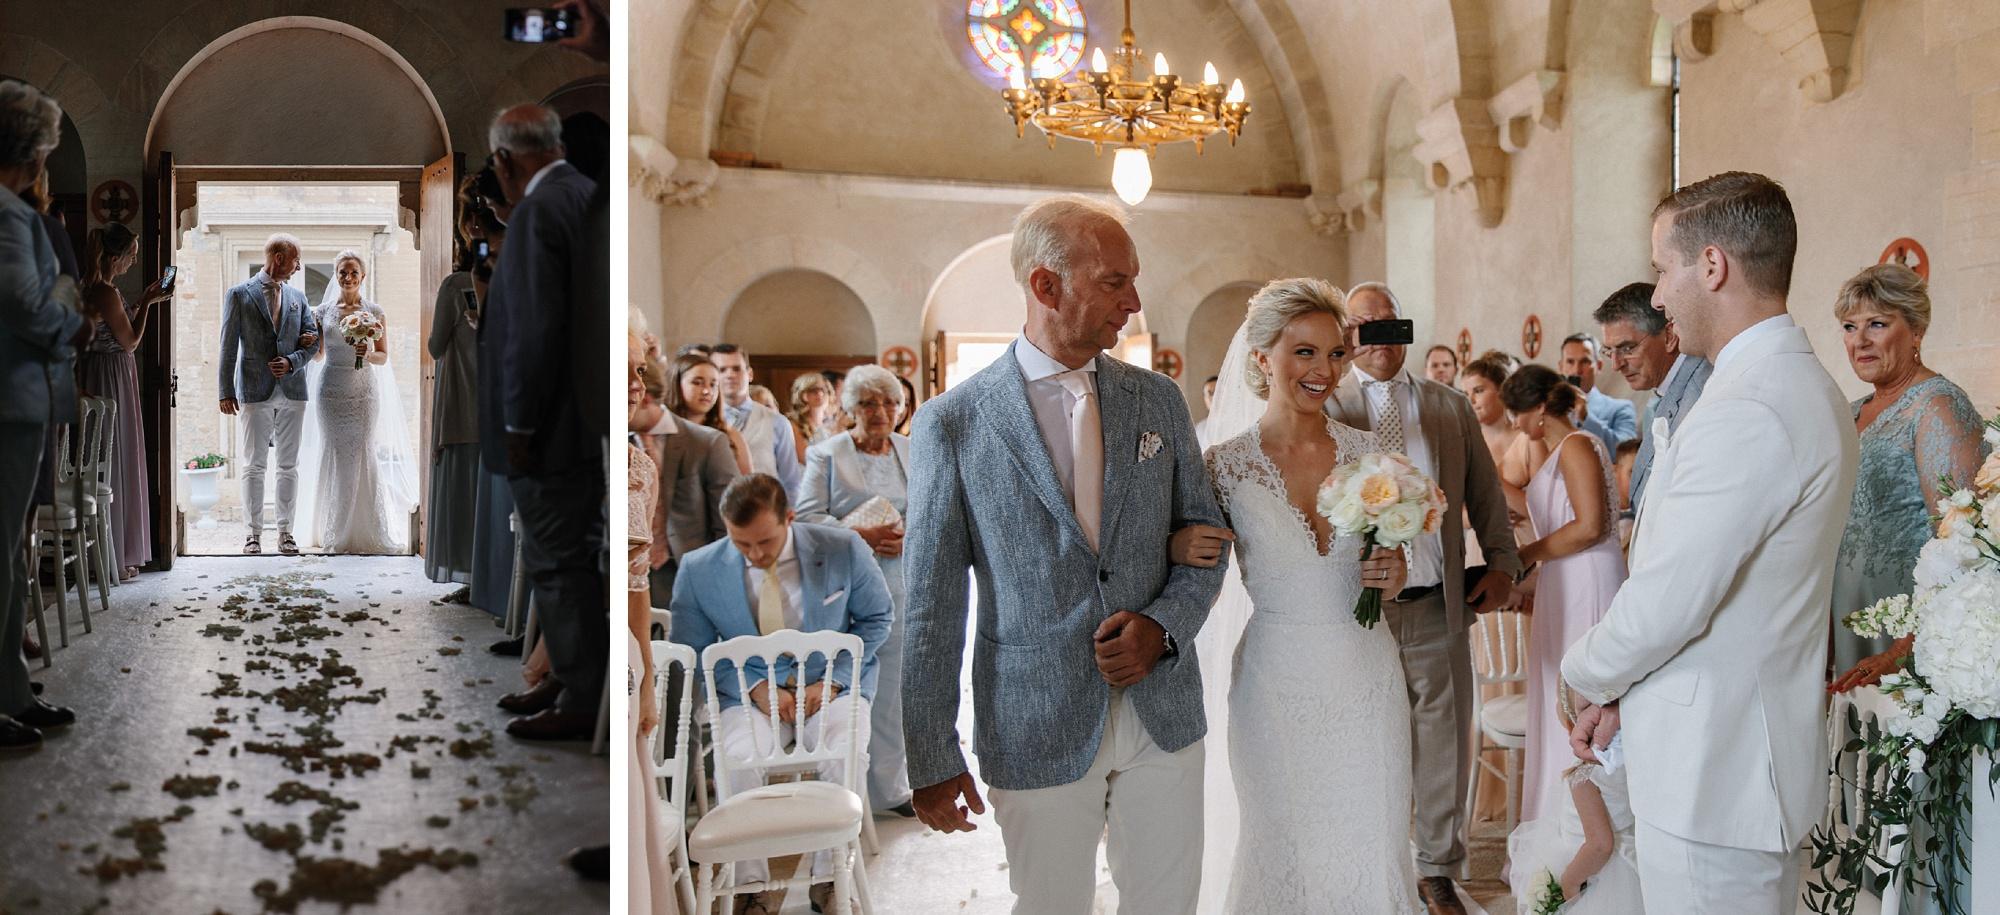 Wedding-Chateau-de-Varennes-043.jpg